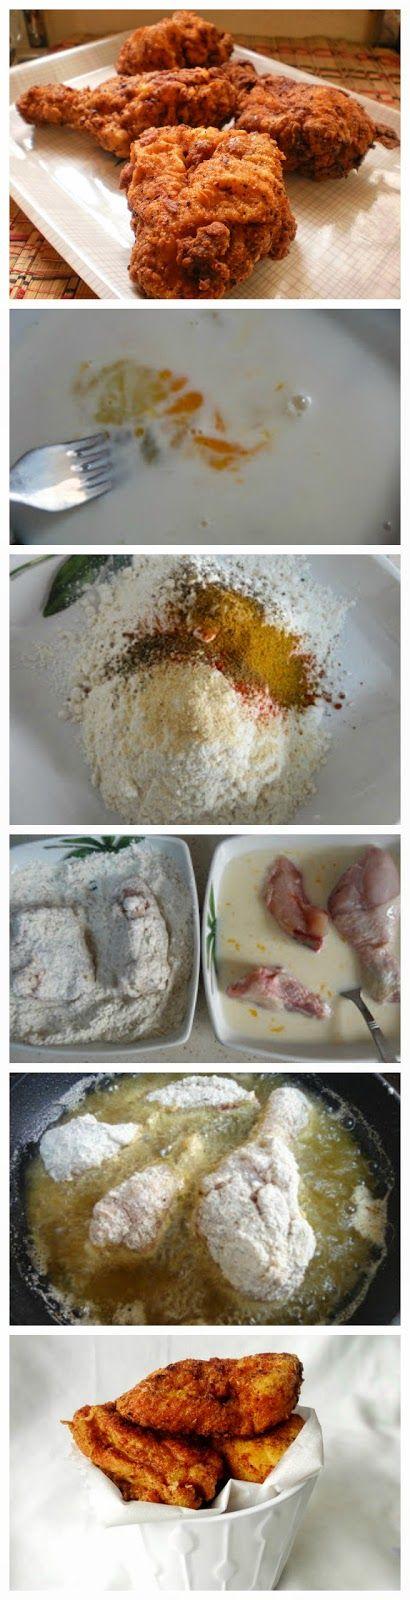 Homemade Kentucky Fried Chicken Recipe Style Chicken KFC The Most Desired Recipes